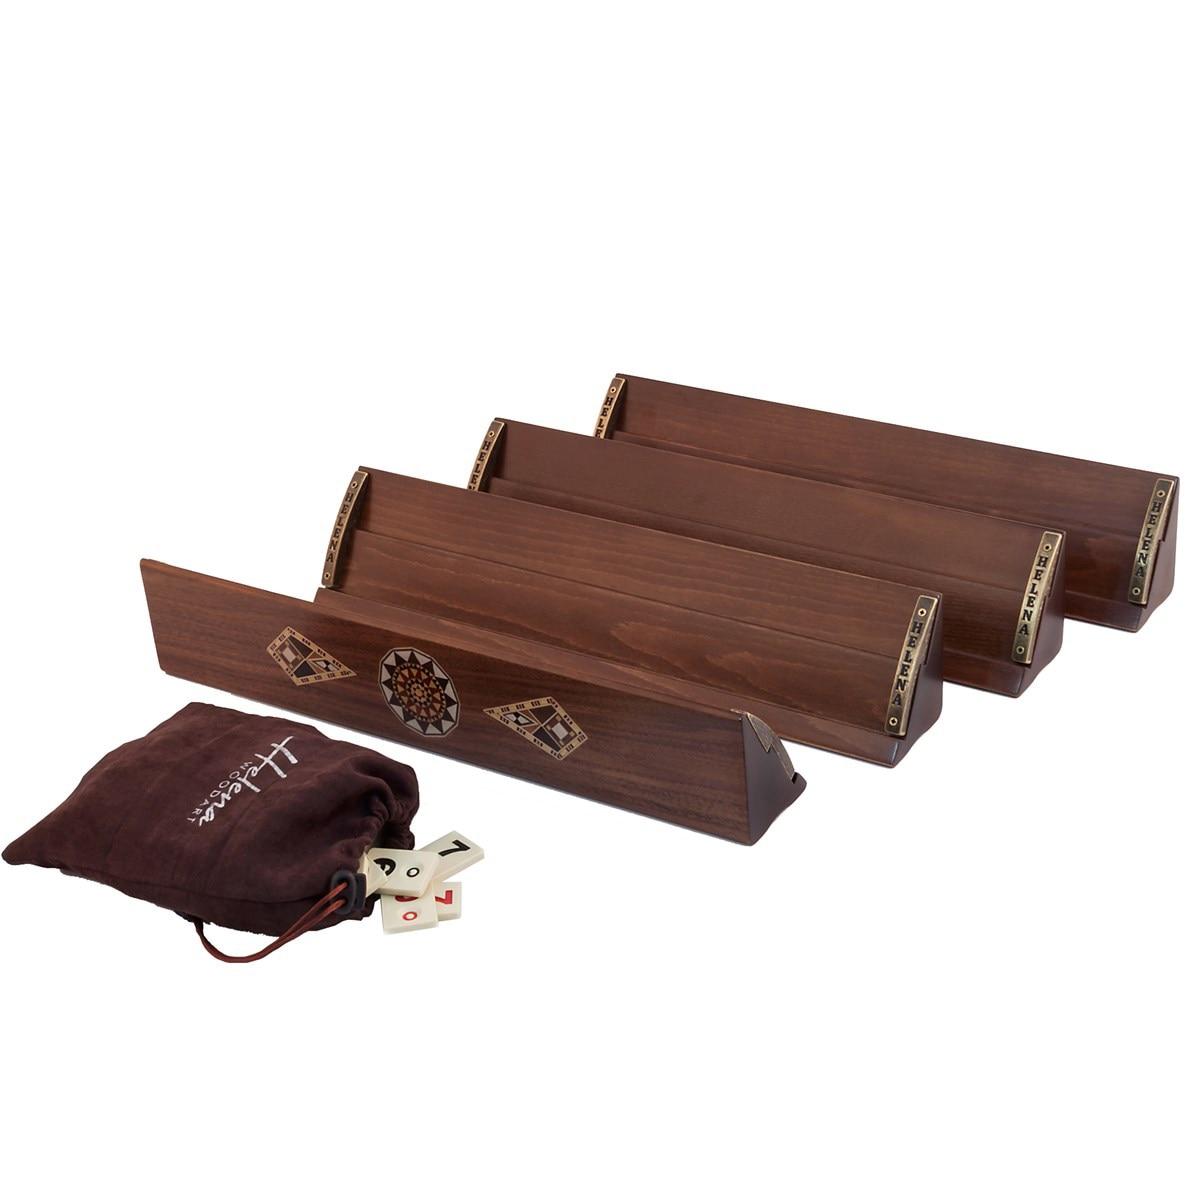 Luxury Handmade Rummy Game Set Walnut Solid Wood Rummykub 4 People Rummikub BoardGame Top Quality Gift Rumikub Ahsap Okey Takımı